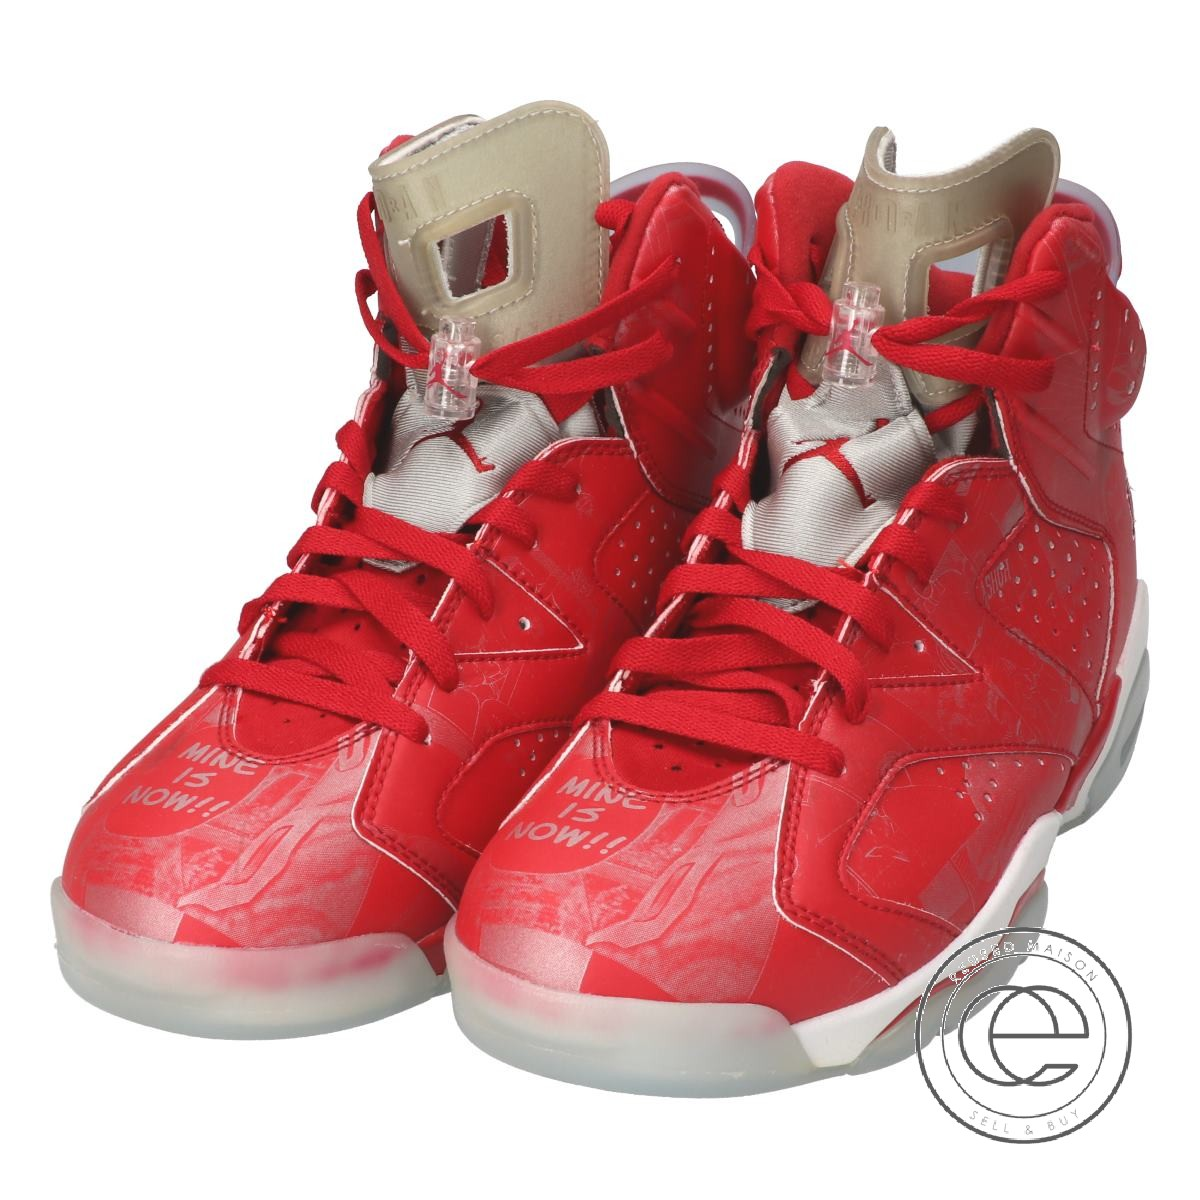 finest selection 5b995 e2c5e NIKE Nike 717,302-600 AIR JORDAN 6 RETRO Air Jordan 6 nostalgic SLAM DUNK  slam dunk sneakers 27 VARSITY RED/WHITE men